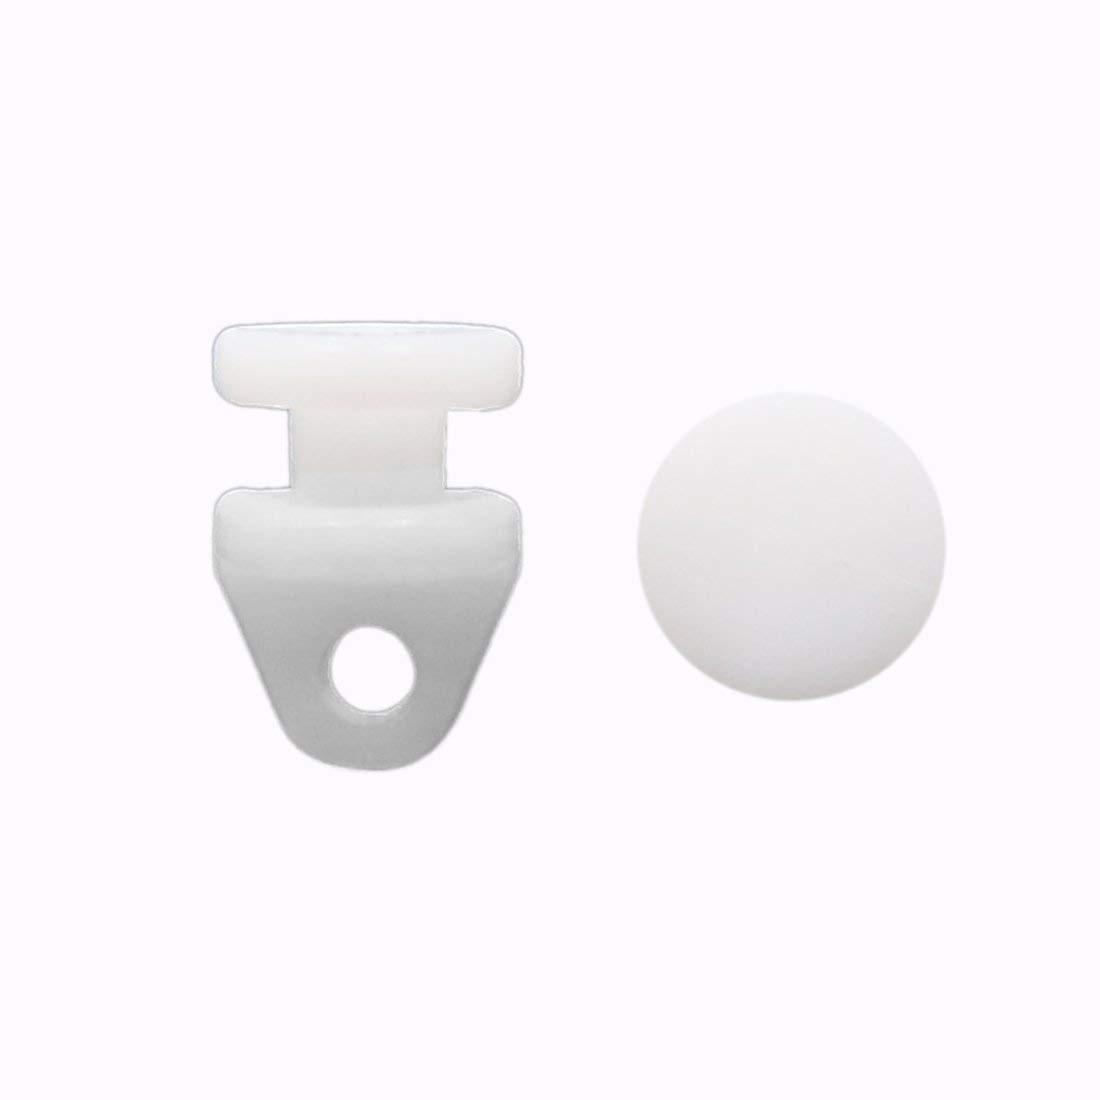 Uxcell, 30 Uds., blanco, 3mm, diámetro del agujero, deslizador de ventana, pista, ruedas, rodillo, portador de cortina